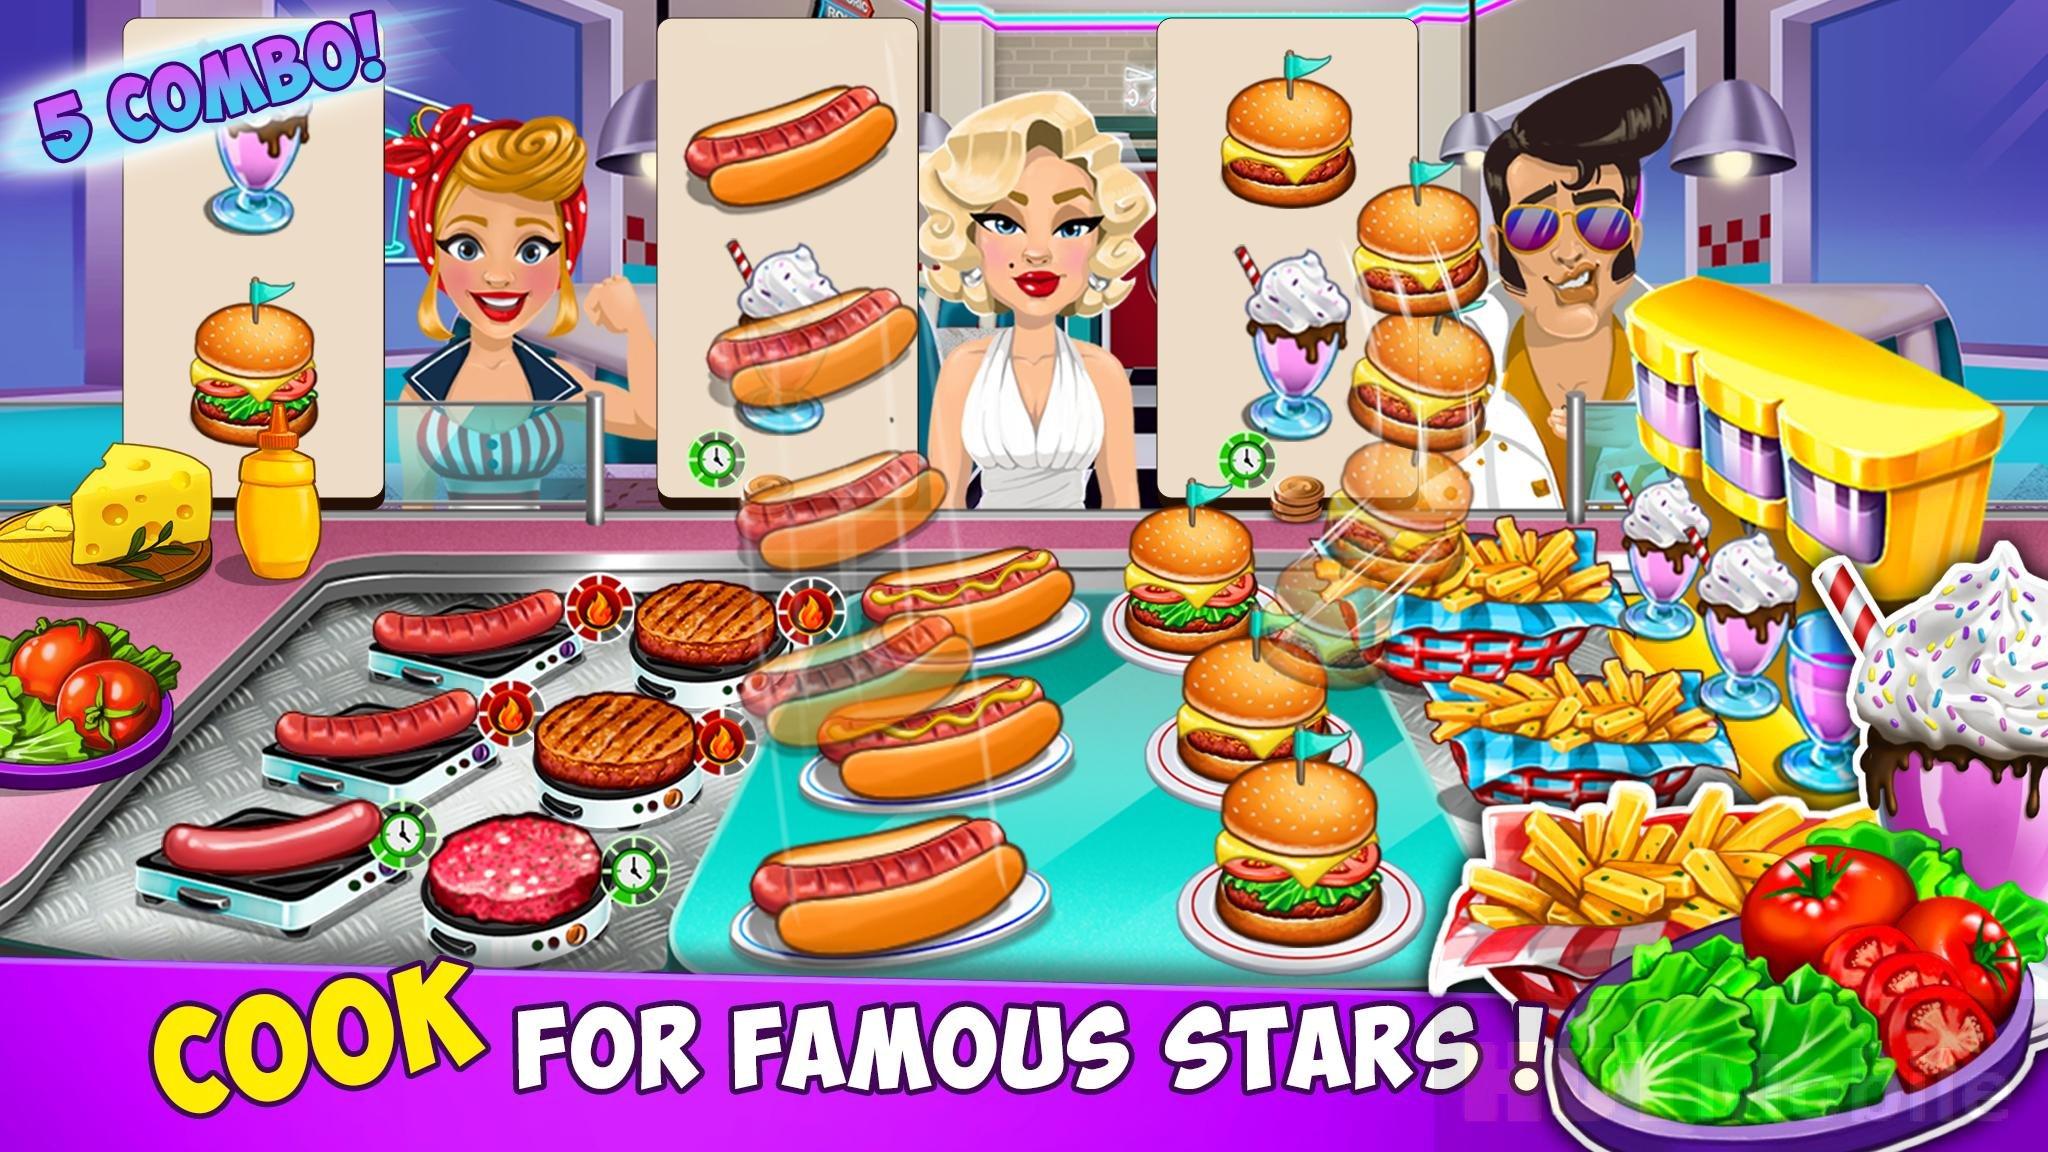 Crazy Kitchen - Free Mobile & Online Games - Zynga